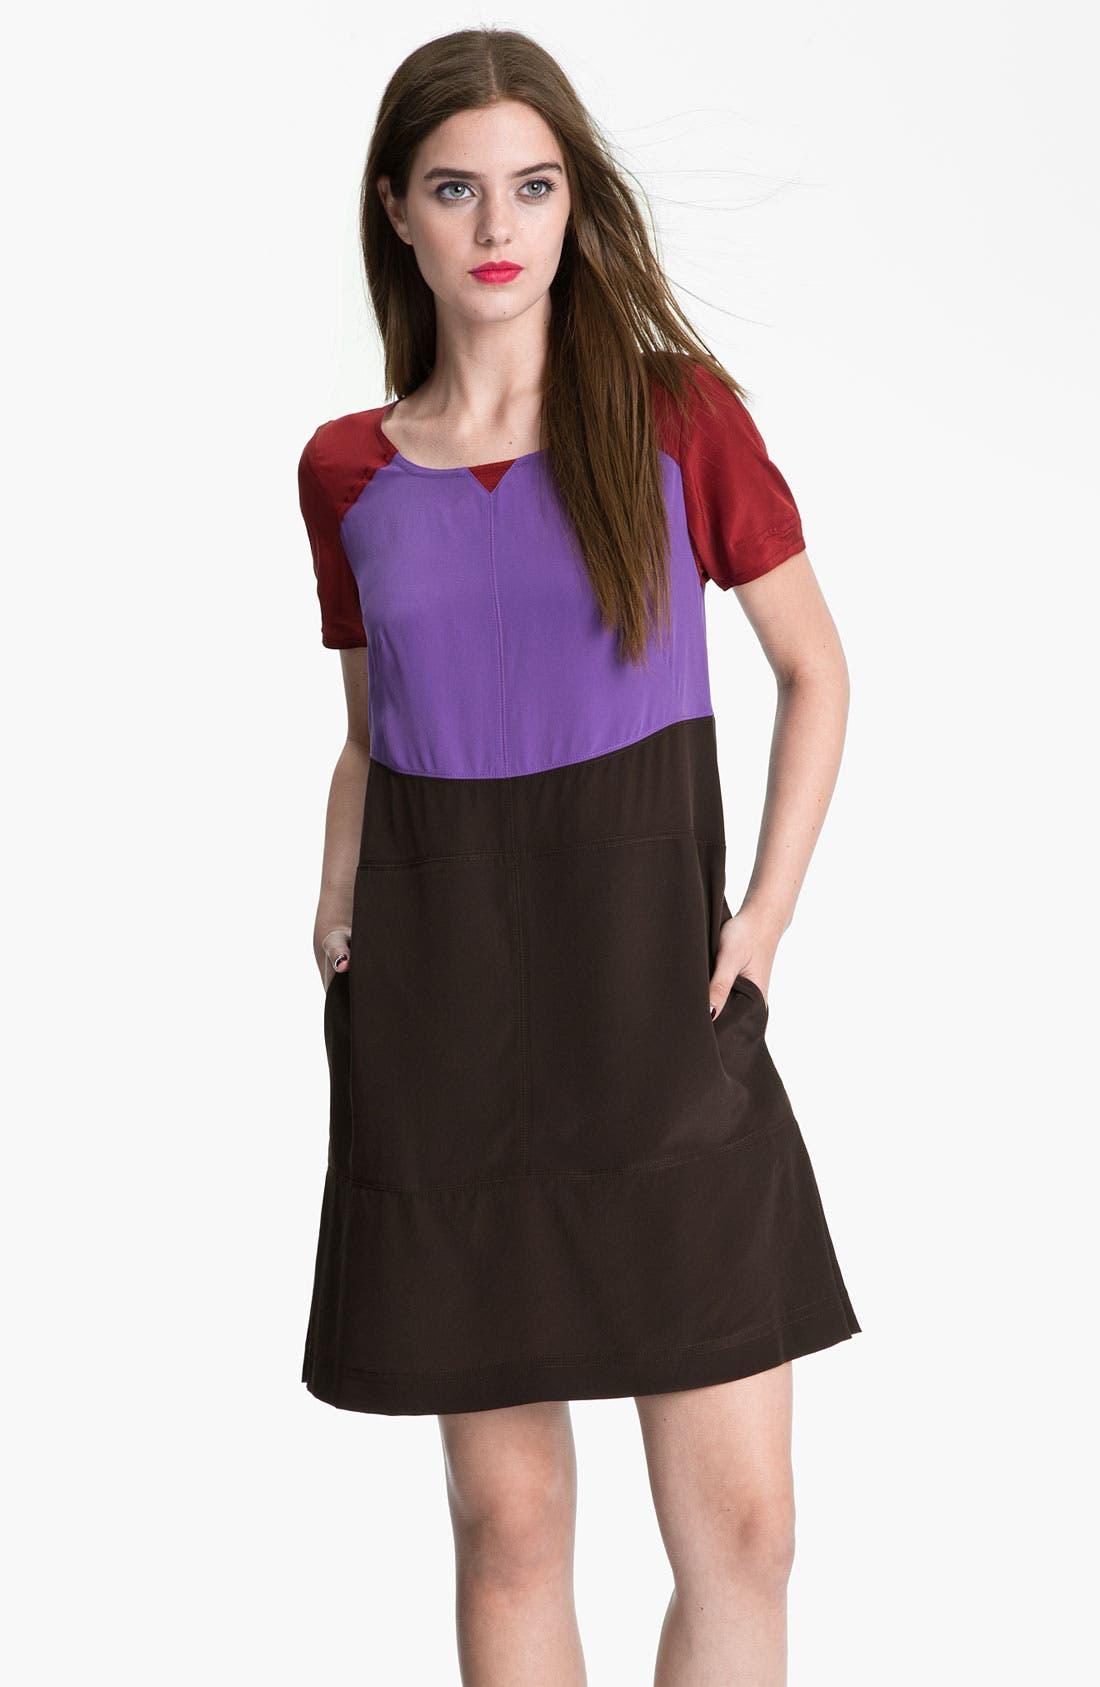 Main Image - MARC BY MARC JACOBS 'Skylark' Colorblock Dress